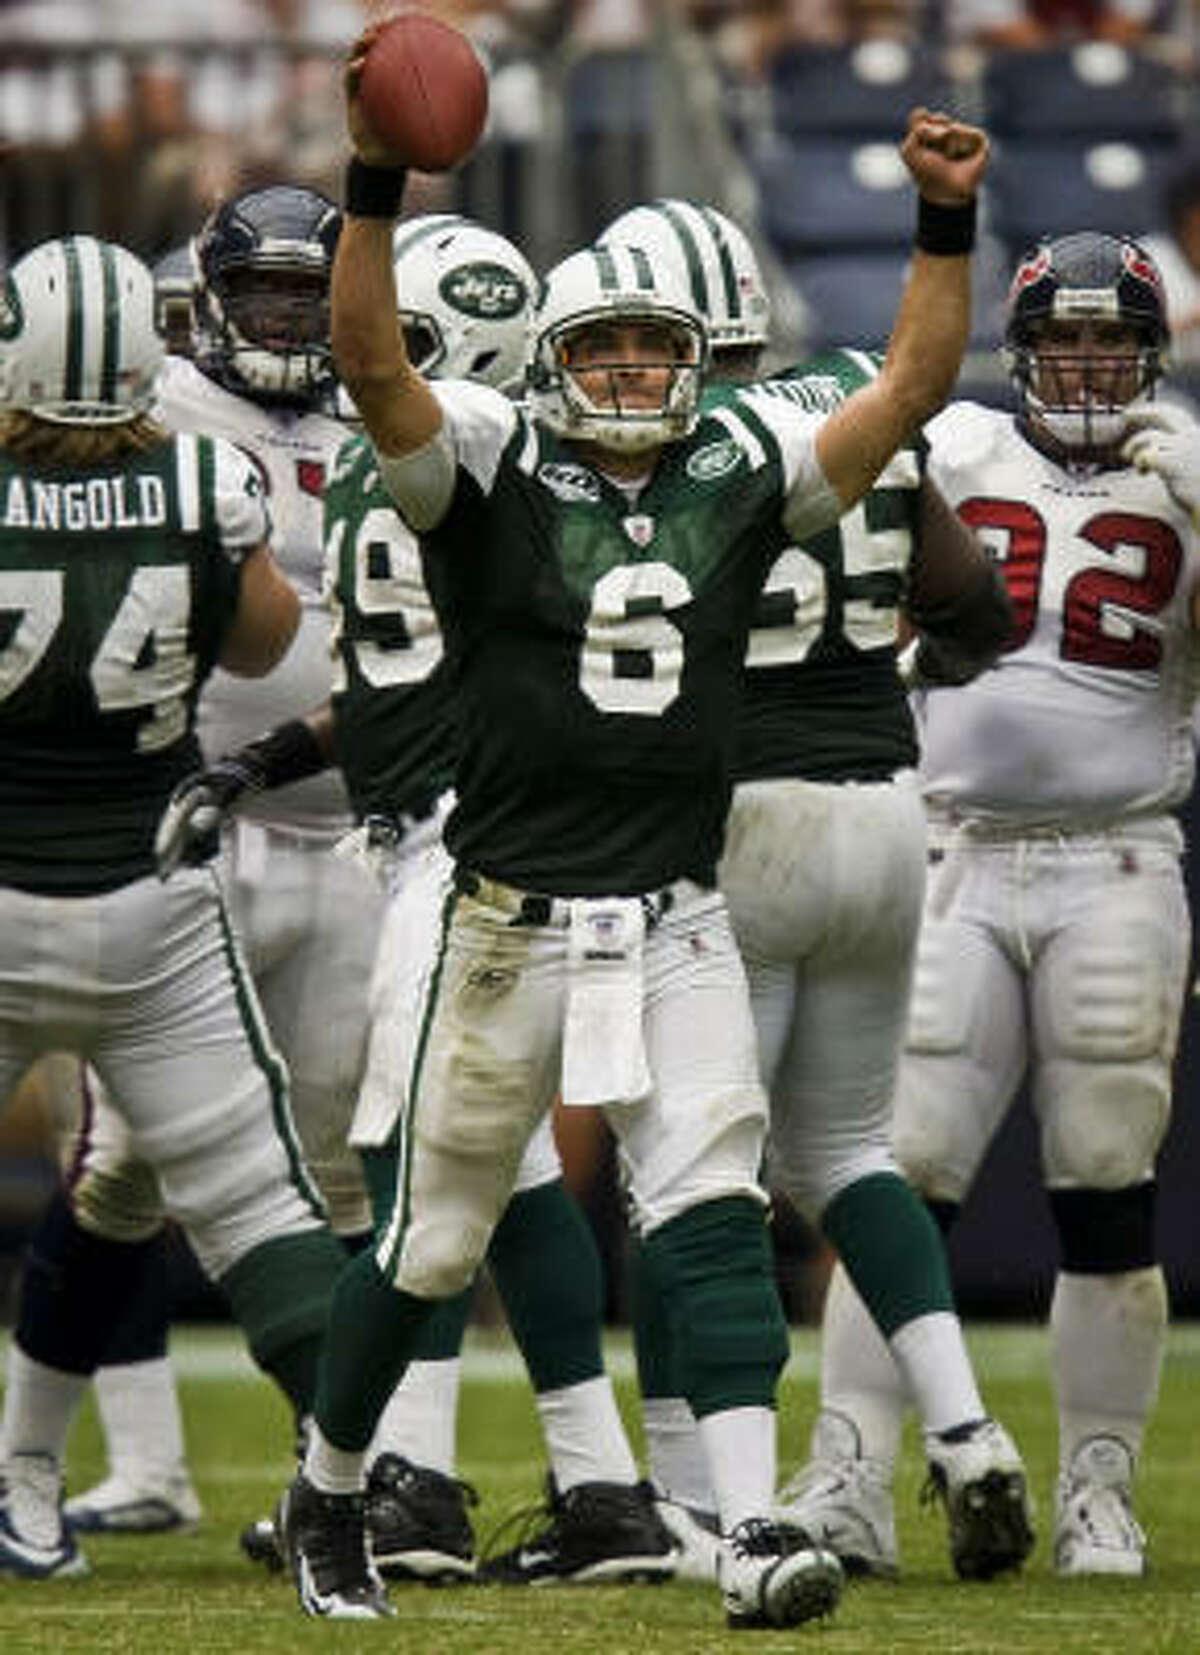 New York Jets quarterback Mark Sanchez celebrates as time expires on the Jets 24-7 victory.